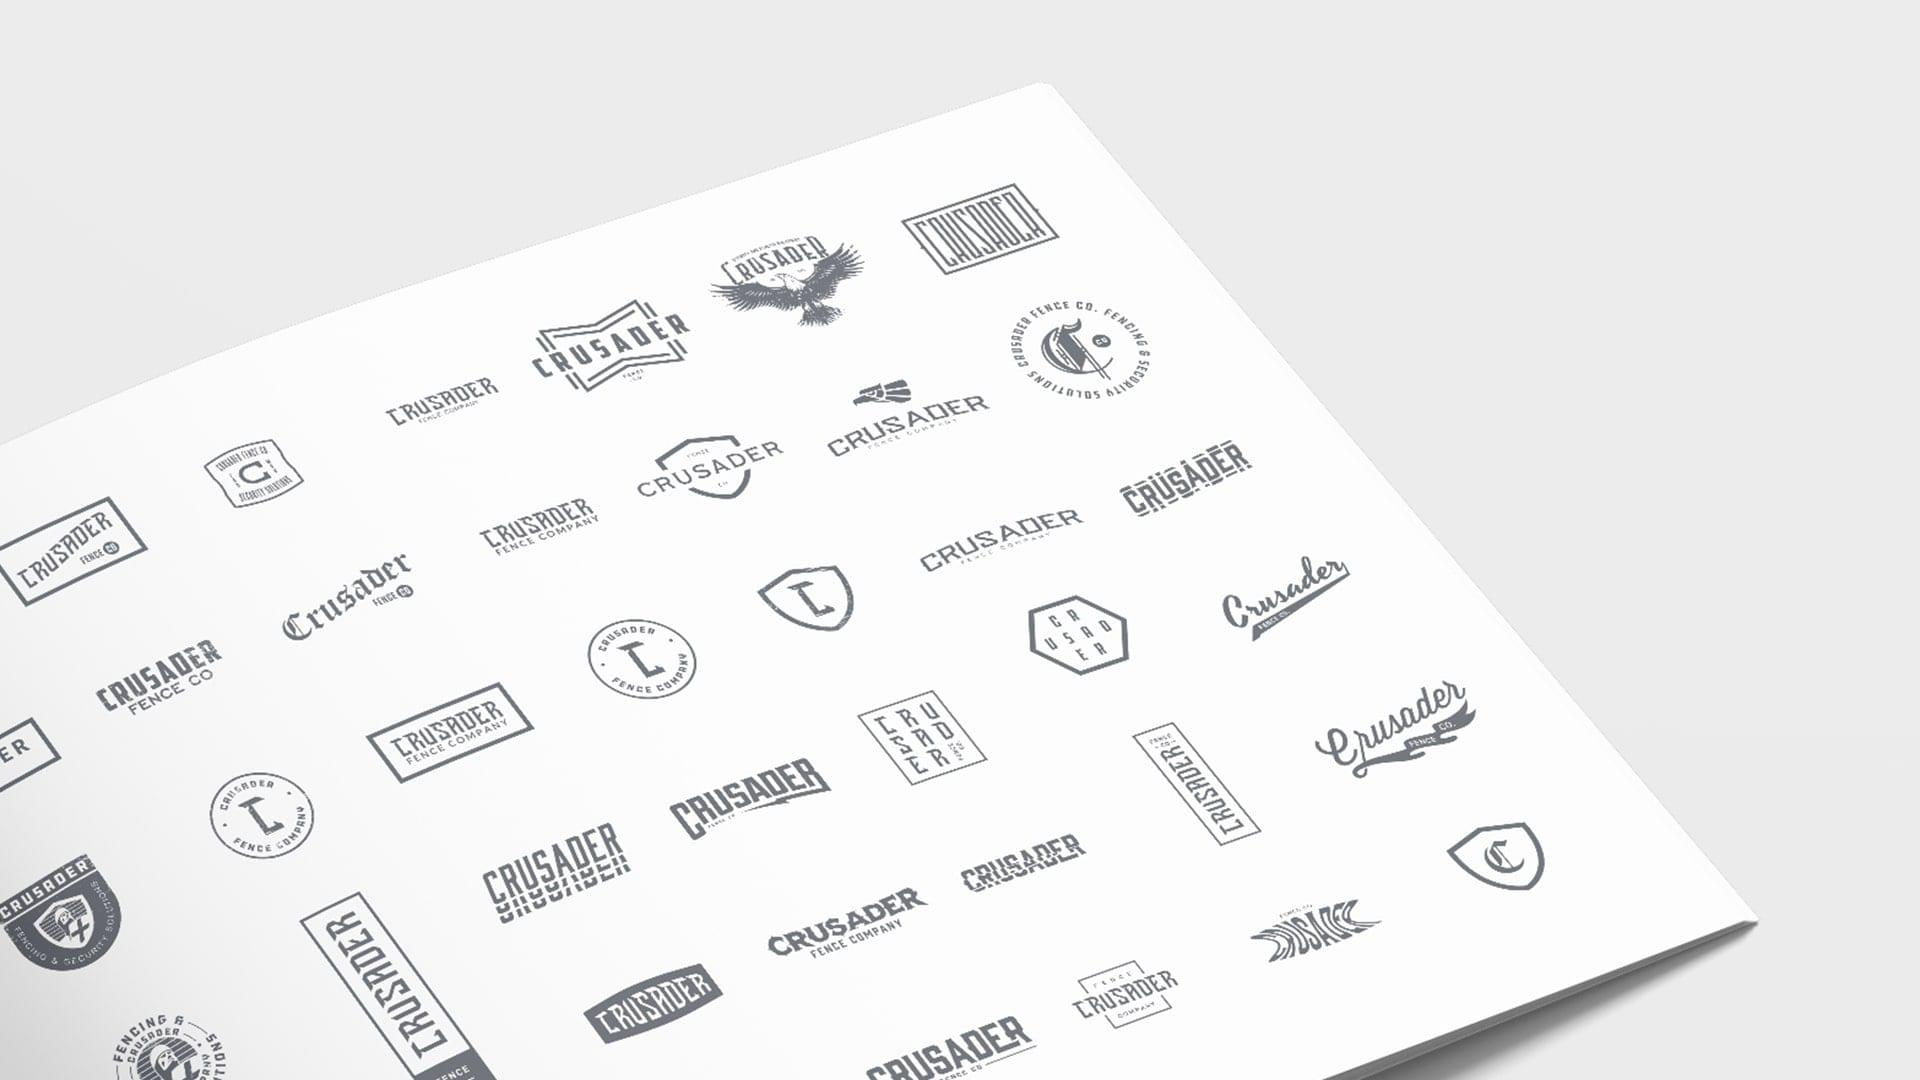 Crusader Fence Company logos